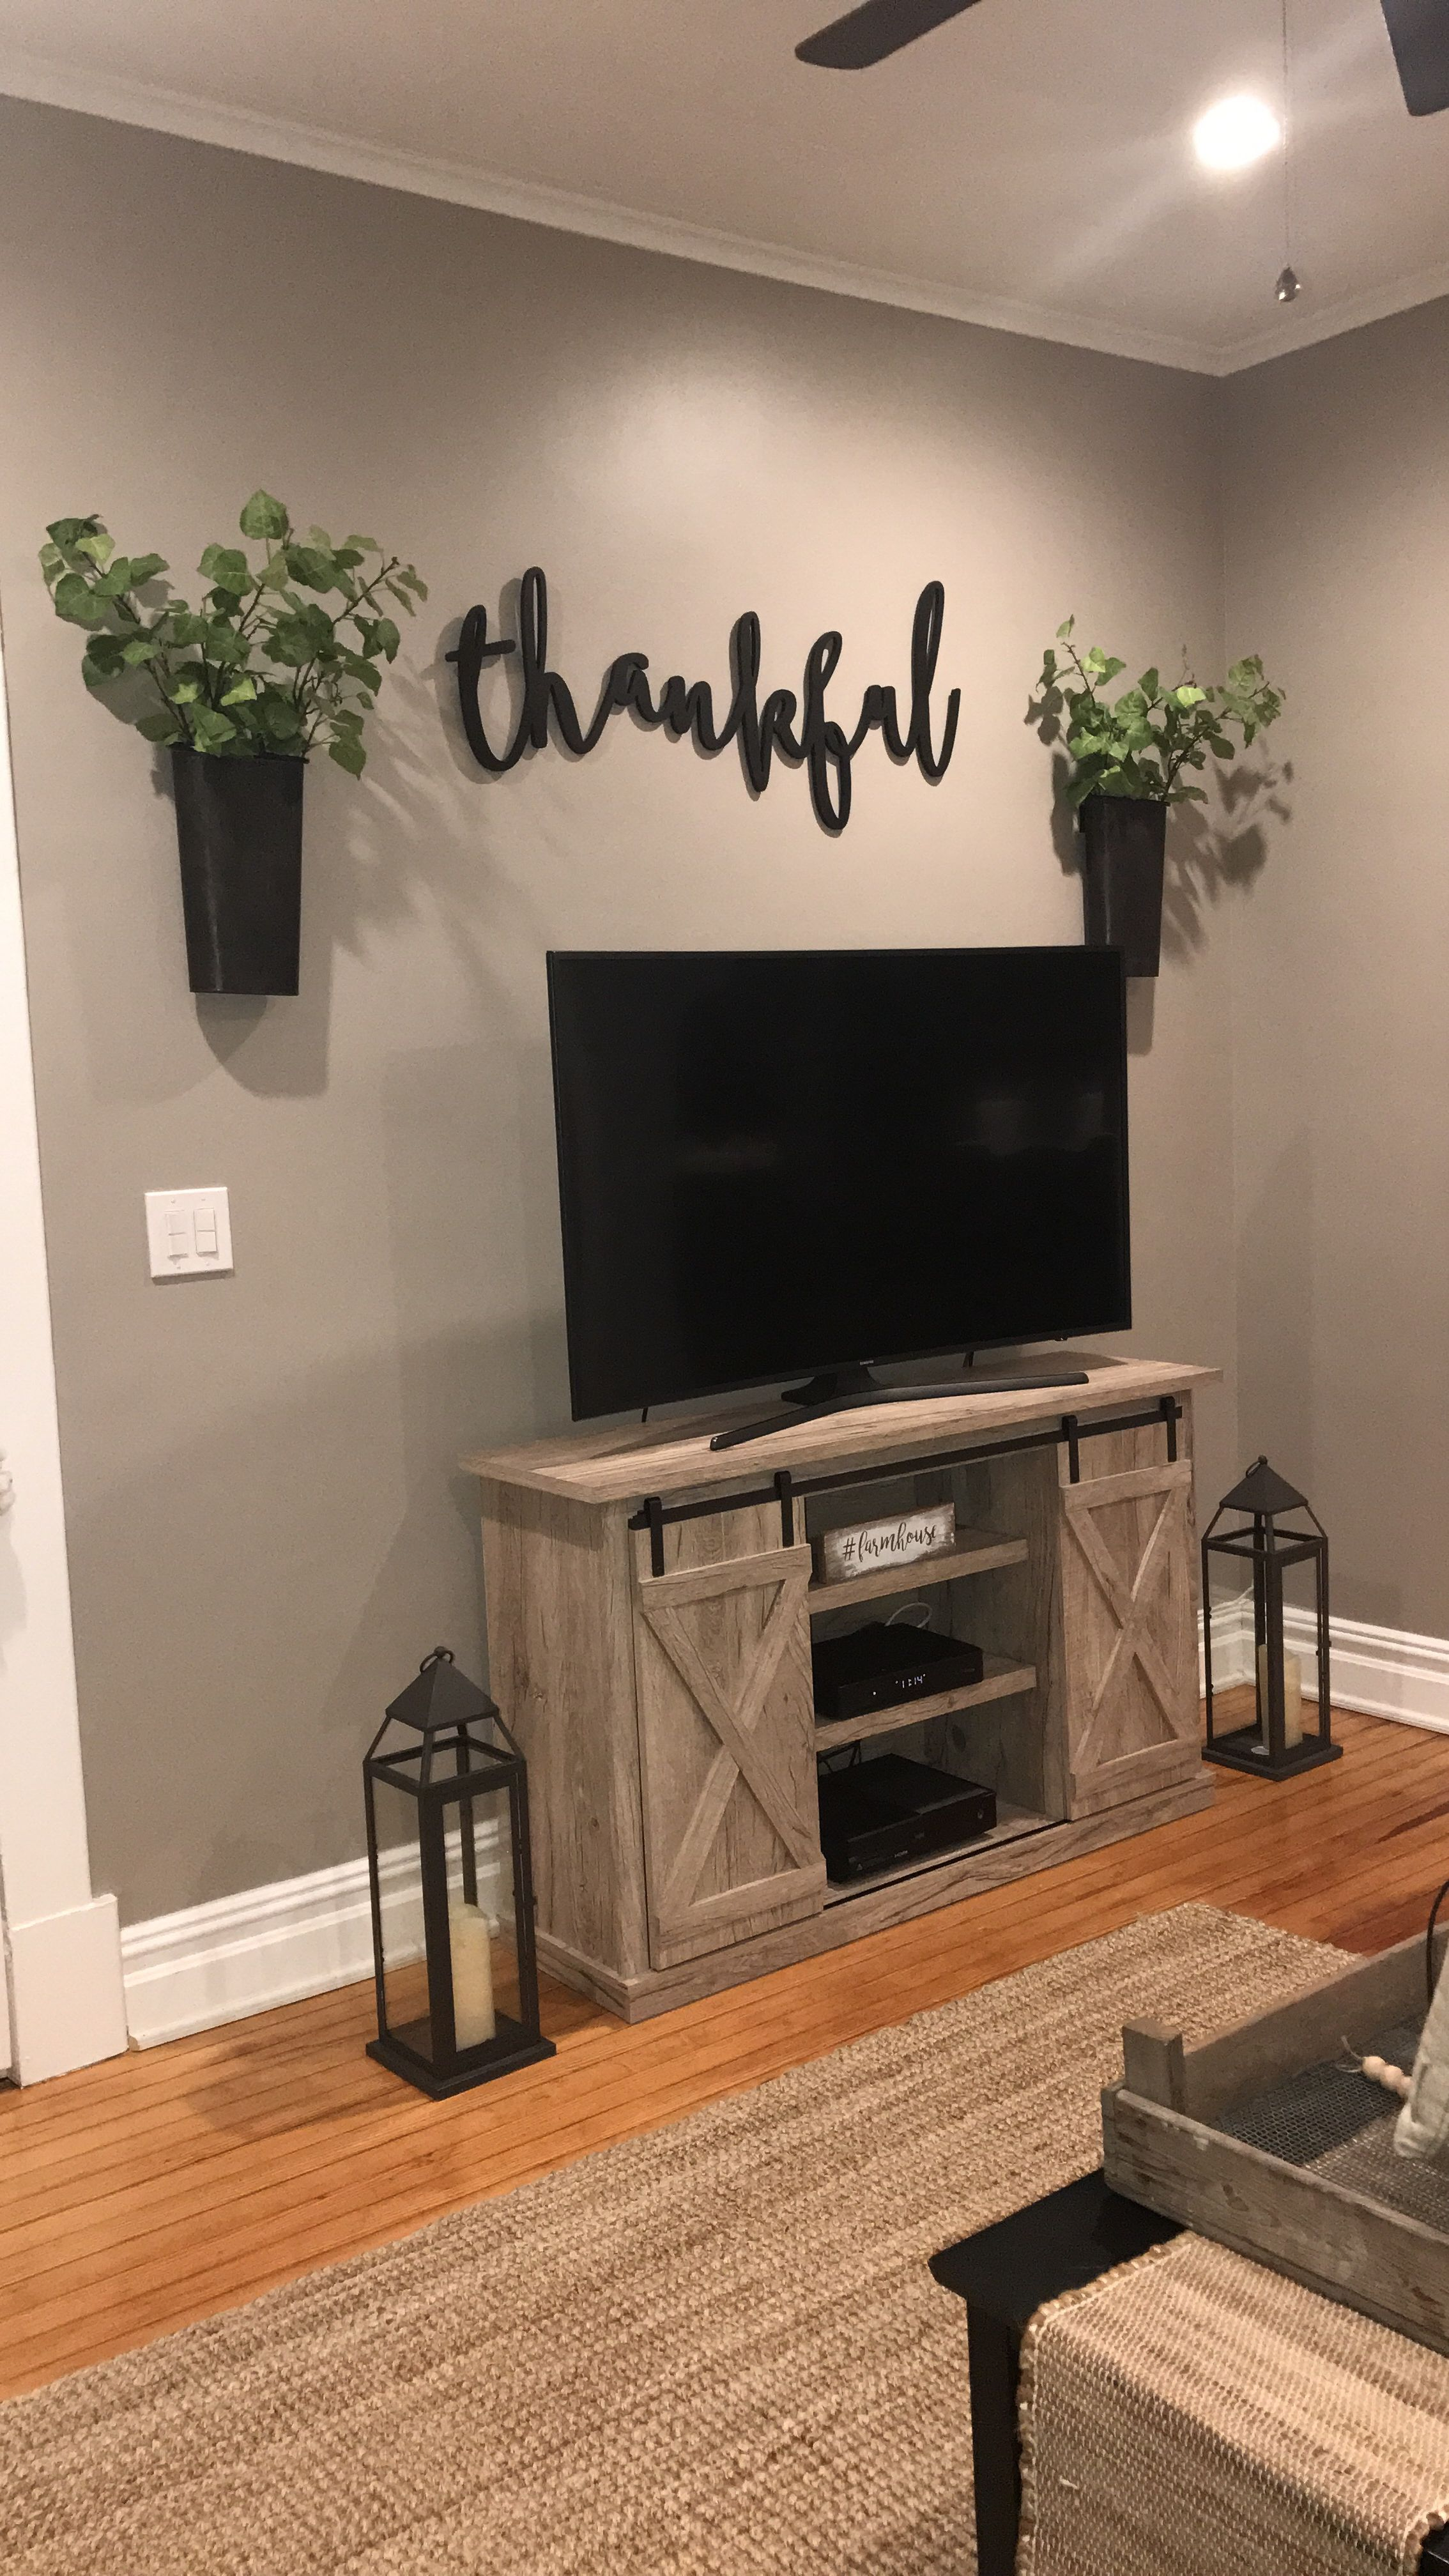 Feather And Birch Thankful Sign Tv Area Farmhouse Decor